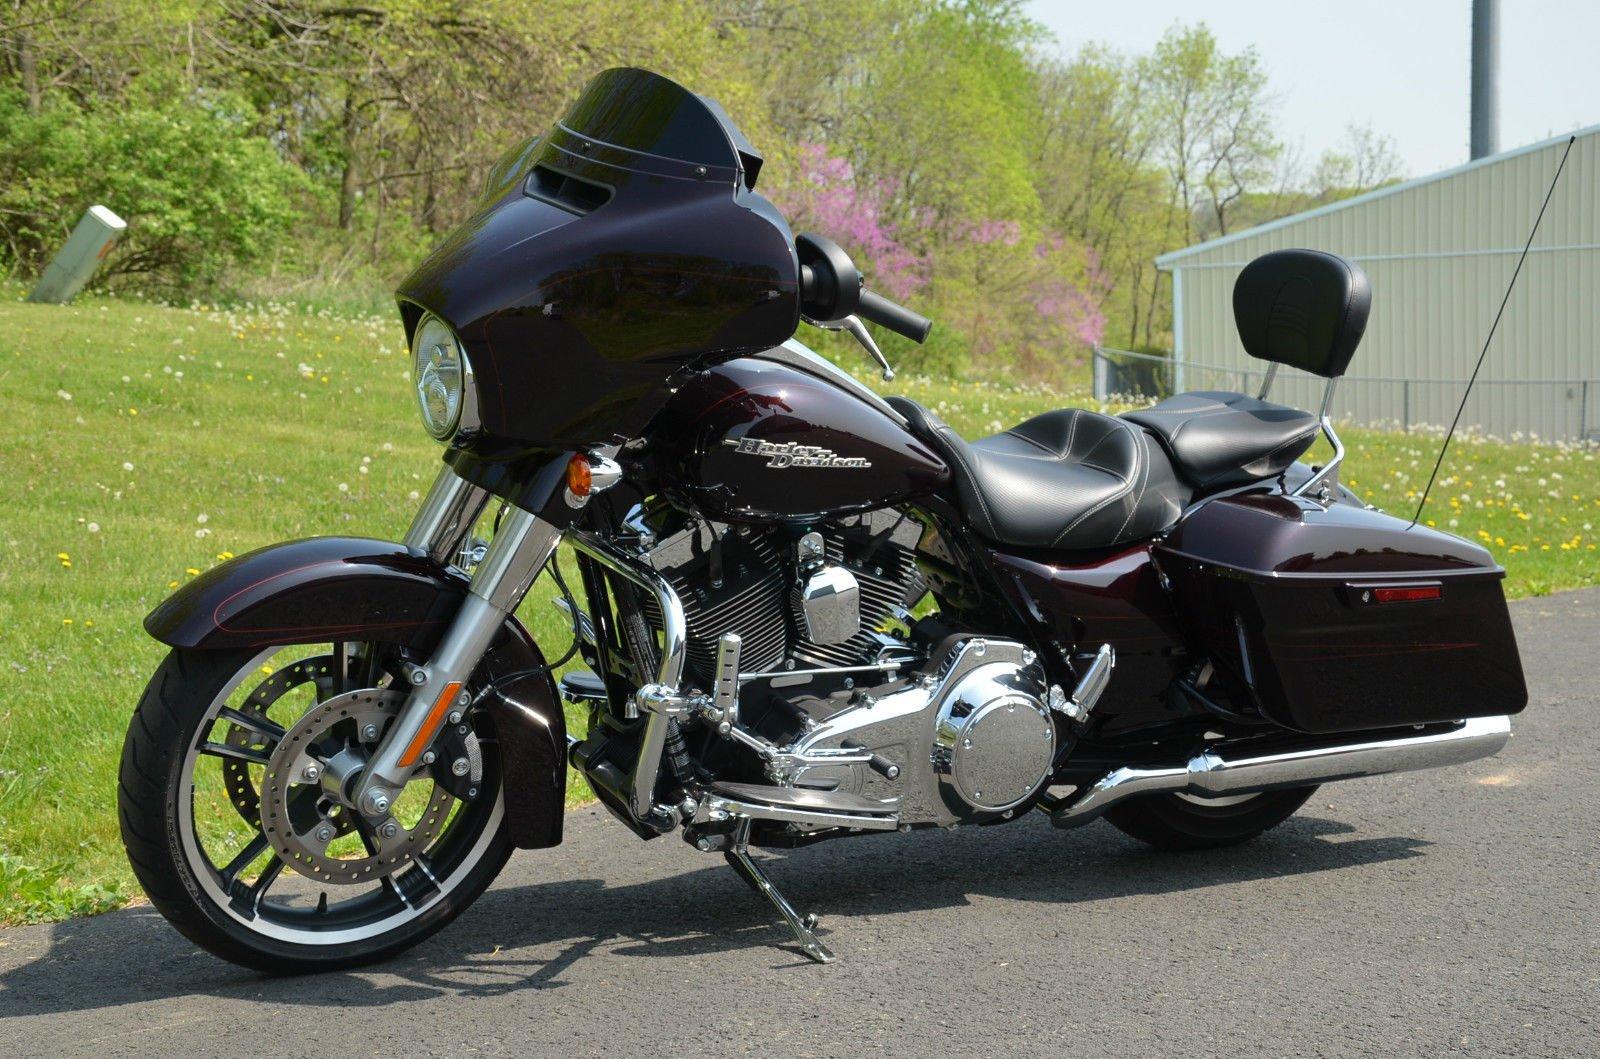 2014 Harley Davidson Street Glide Special FLHXS Motorcycle